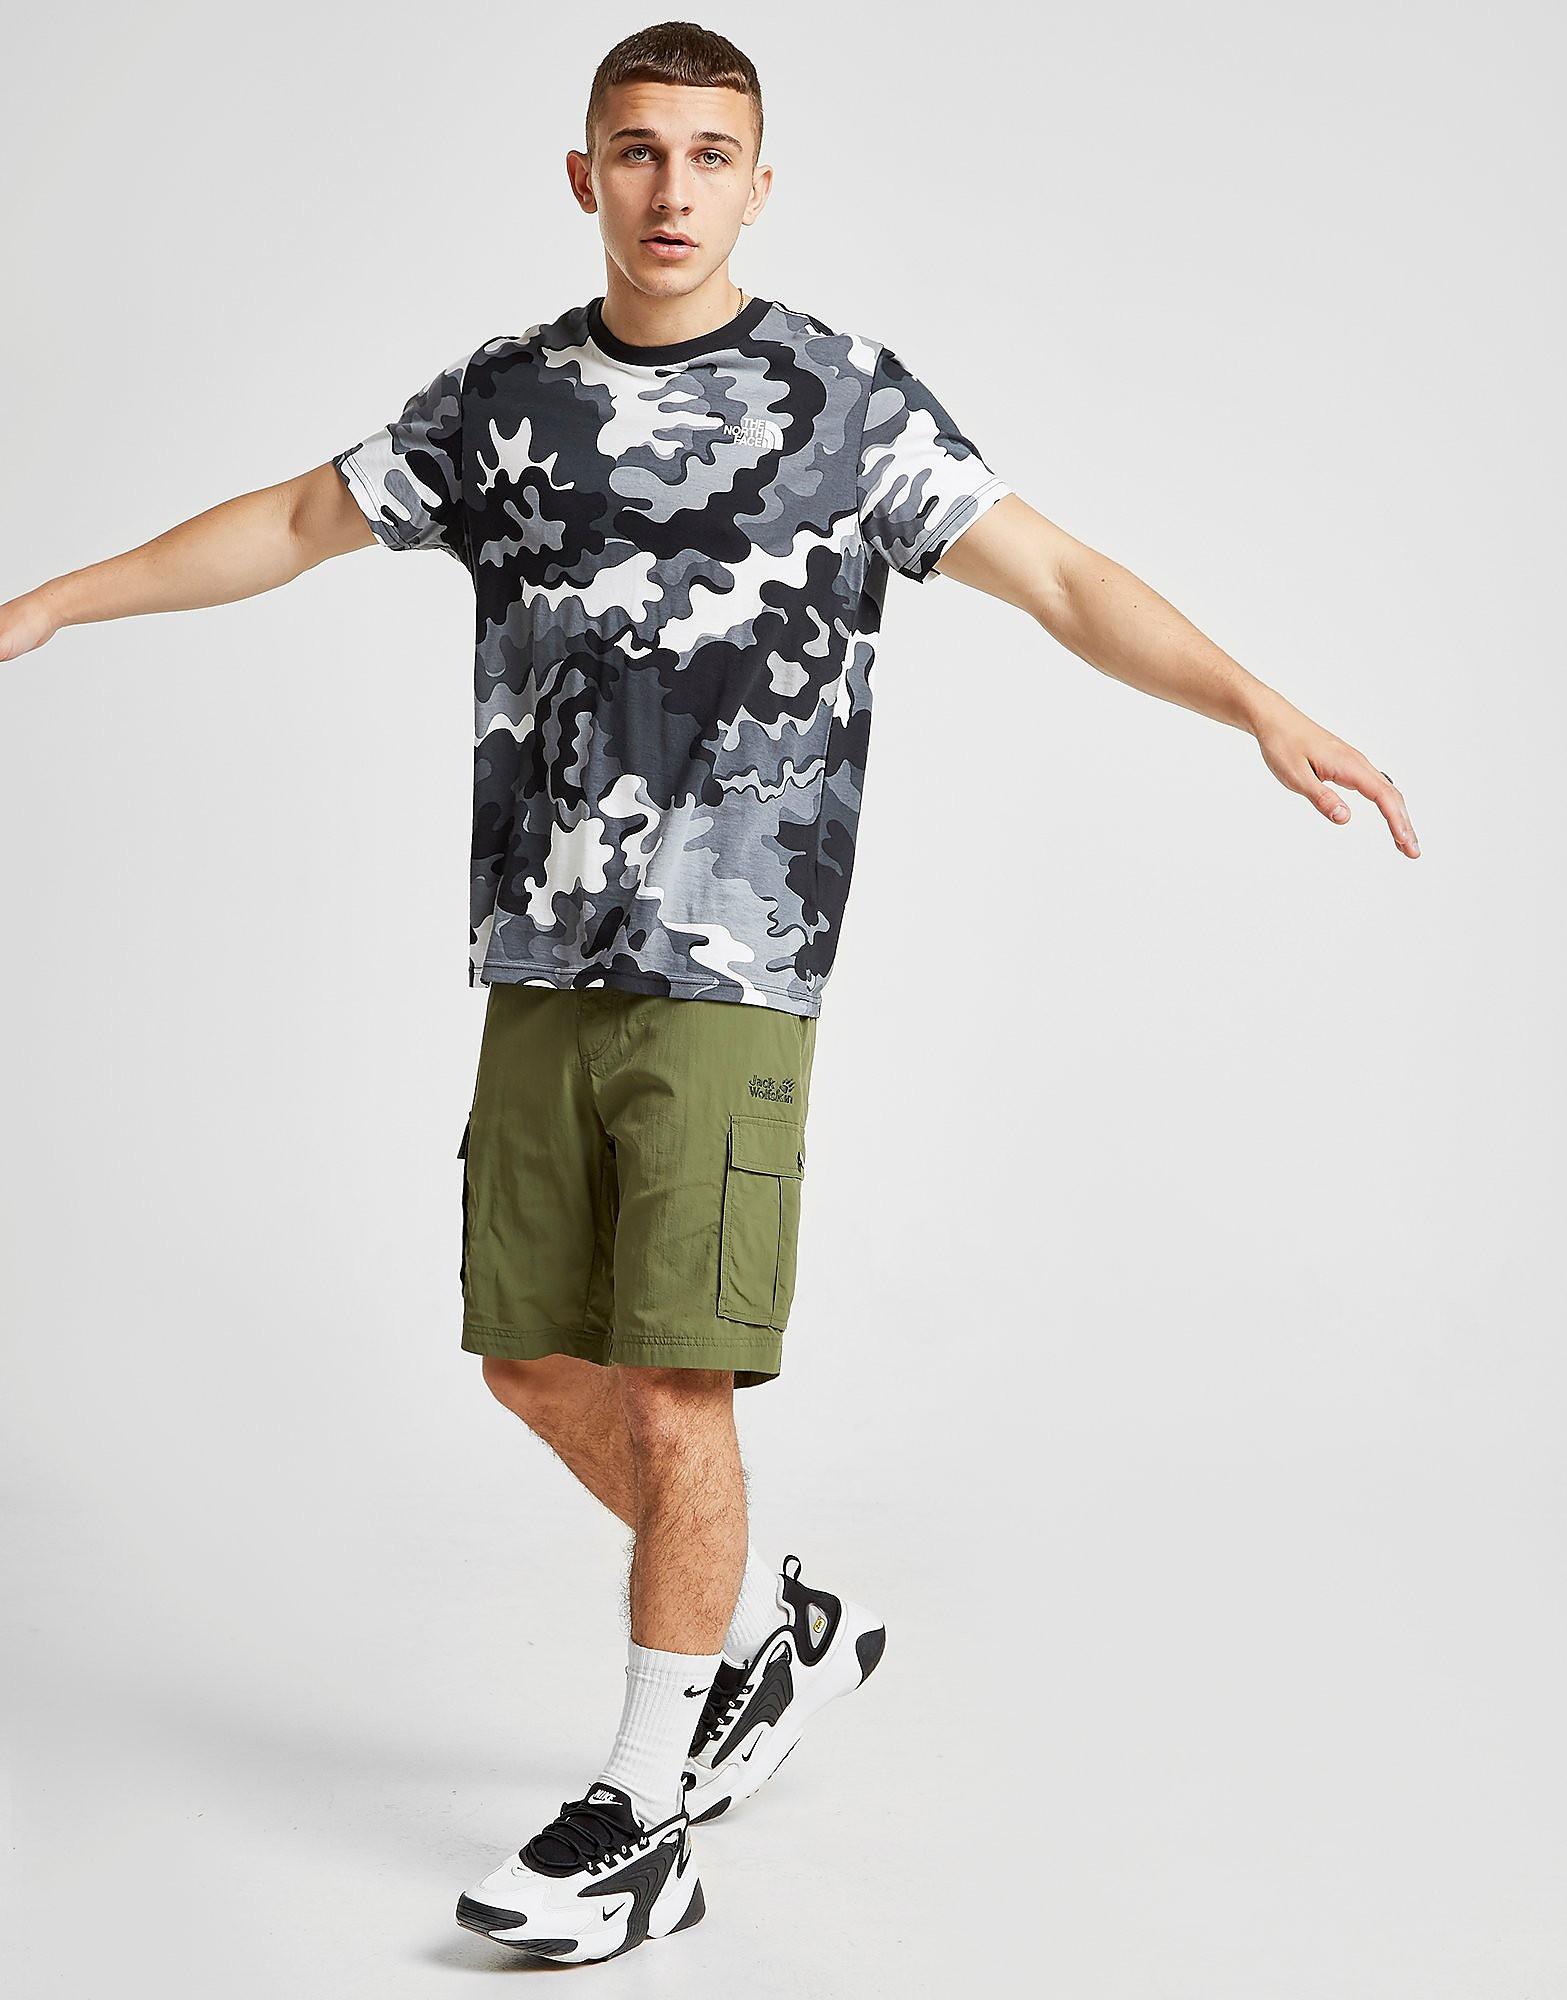 Jack Wolfskin Cargo Shorts